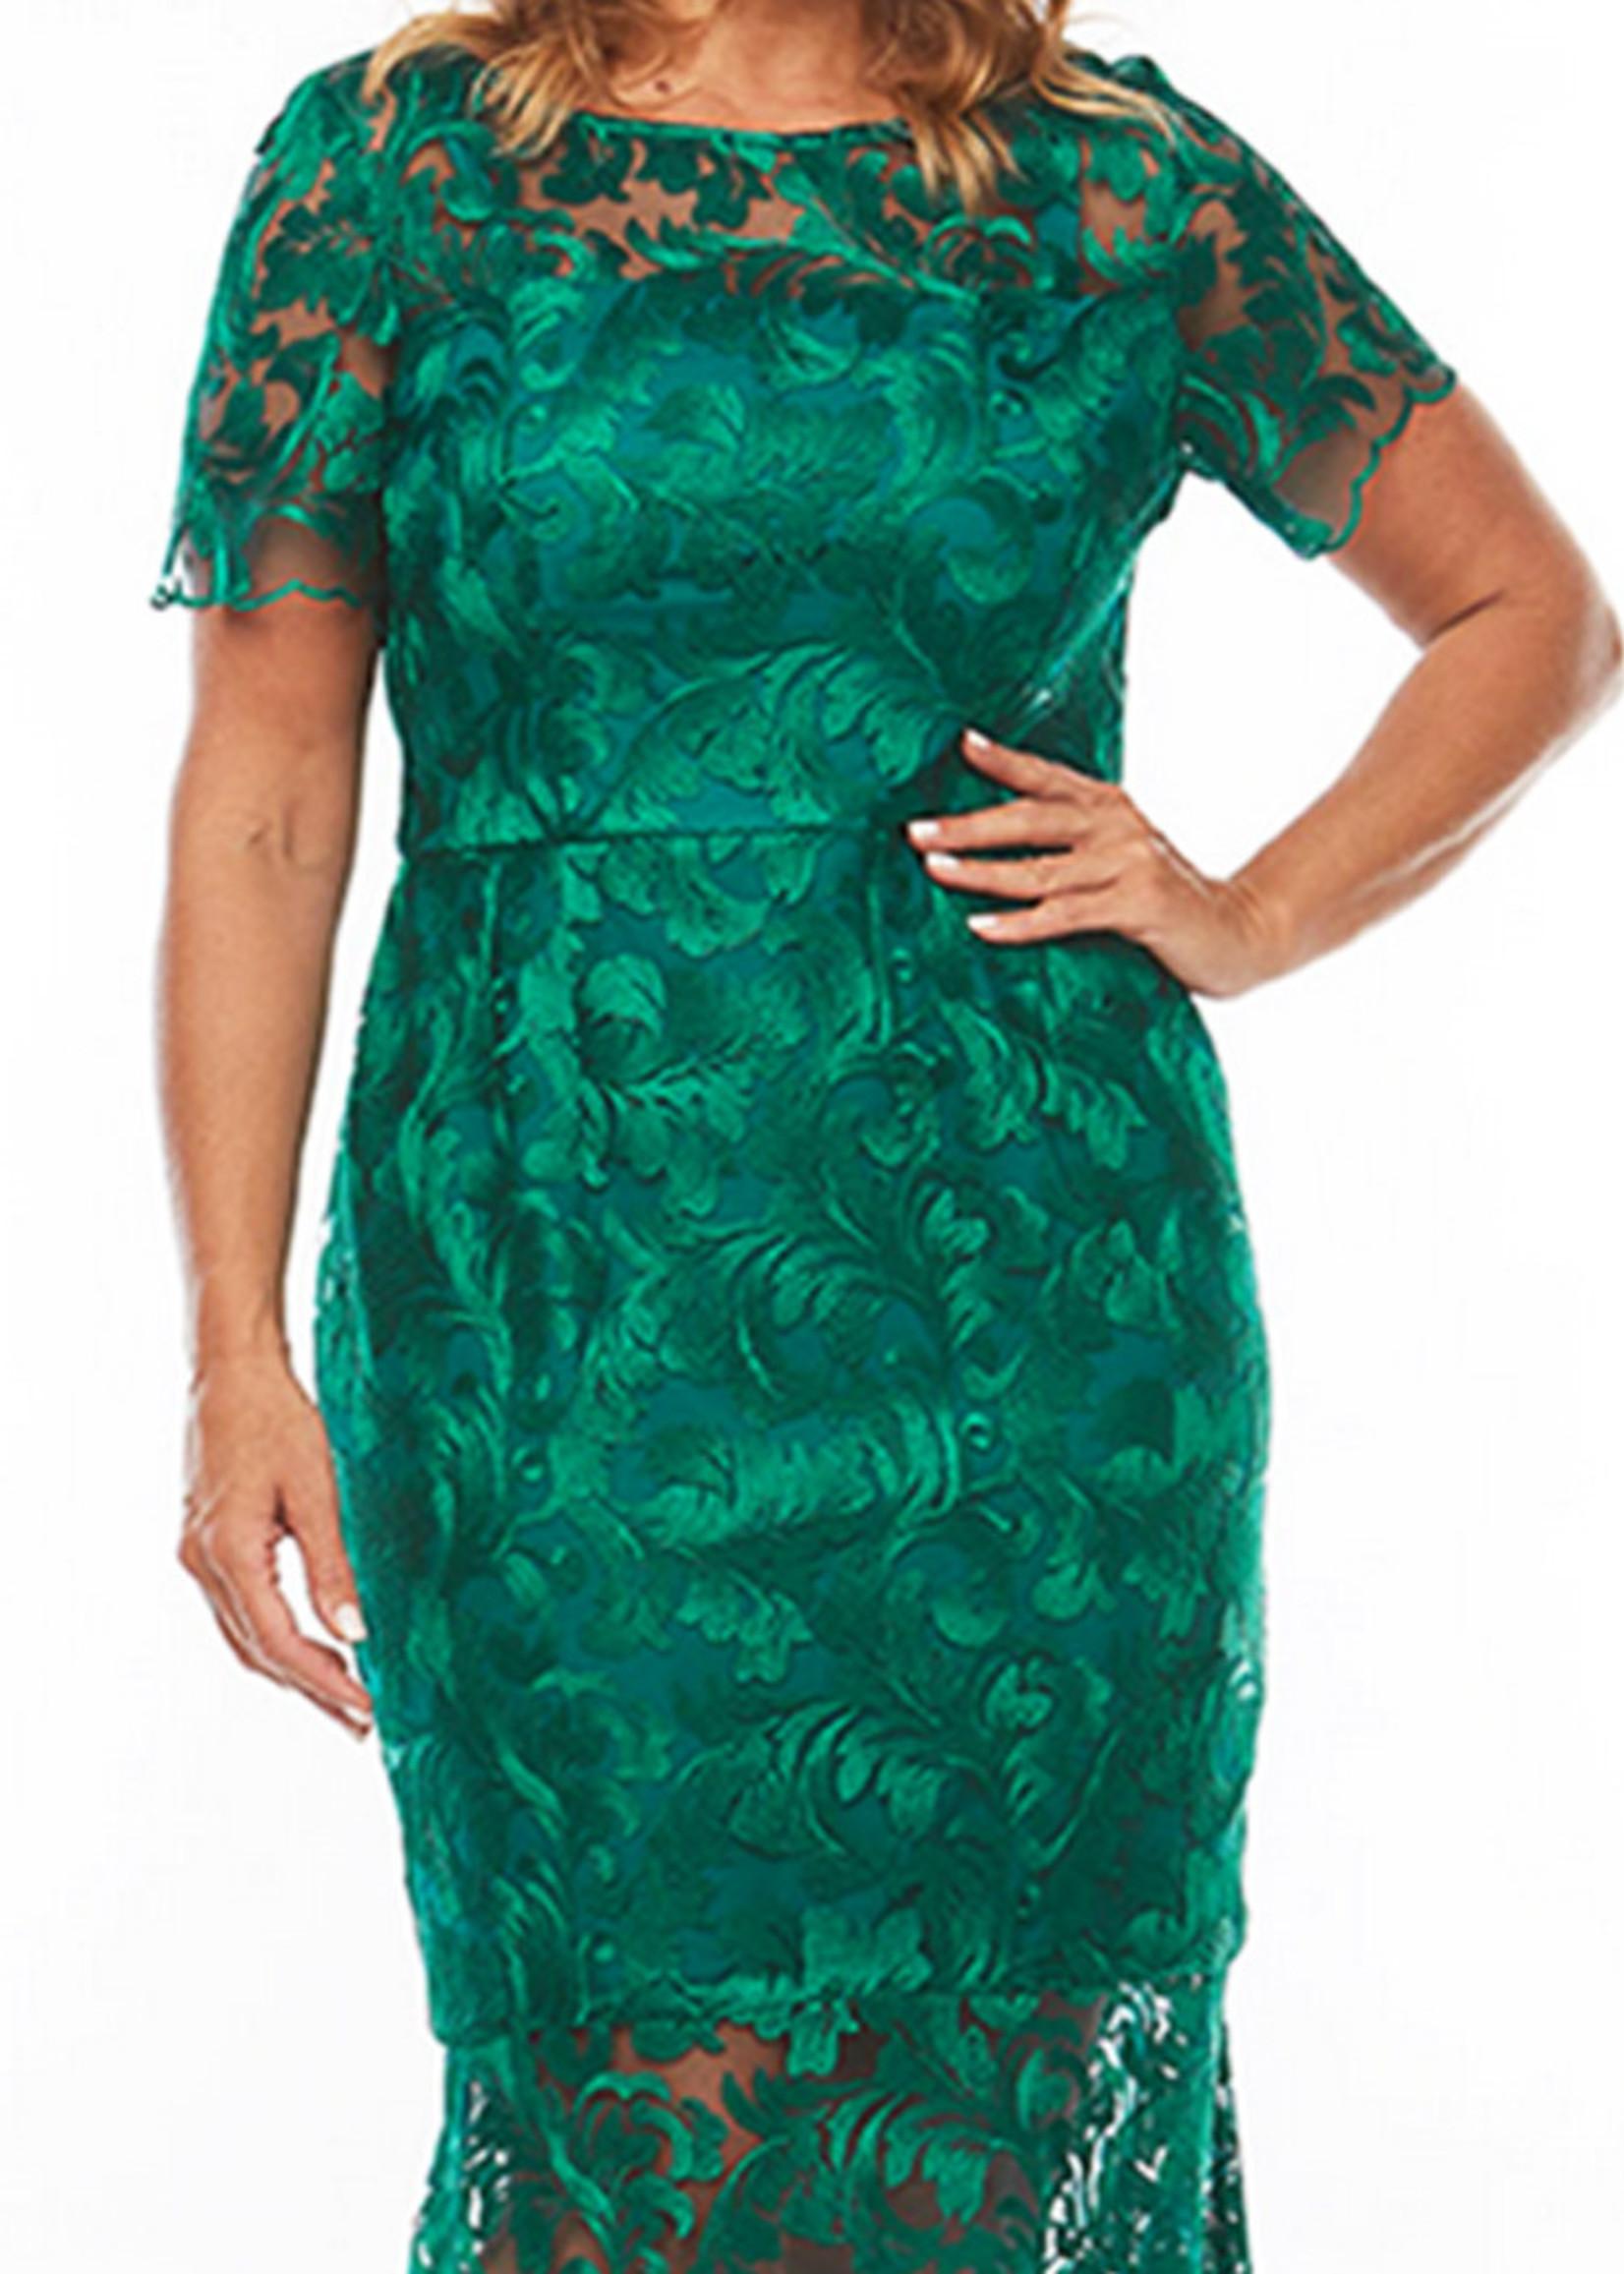 Layla Jones LJ0559 Jade